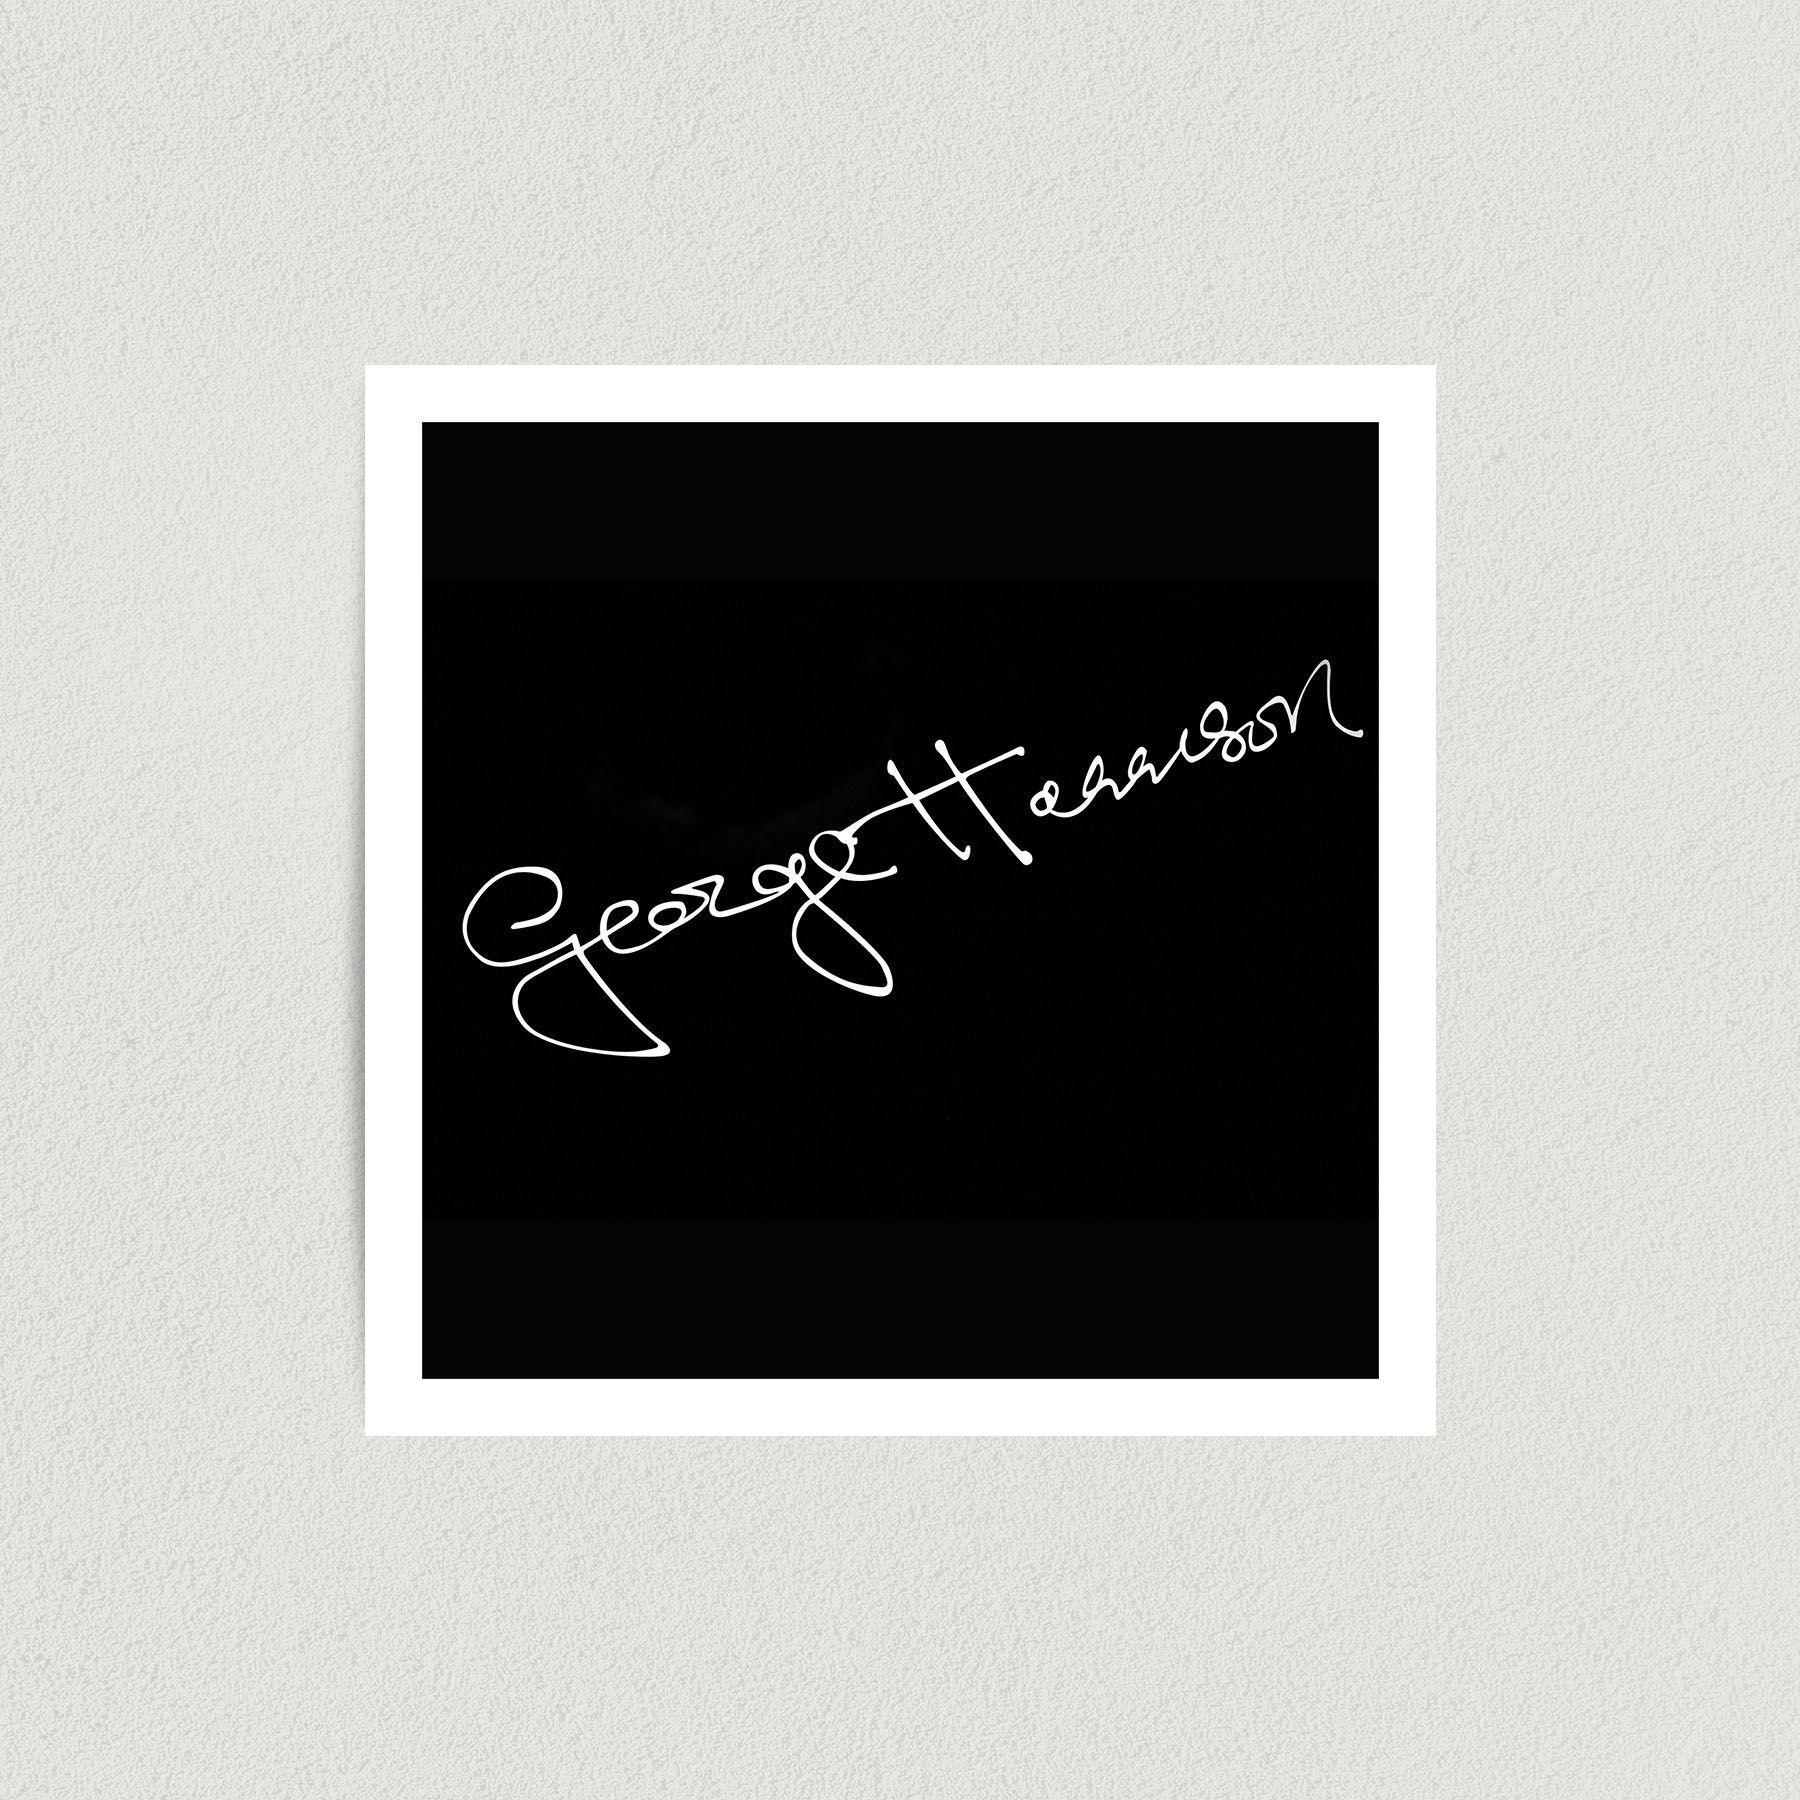 George Harrison Autograph Art Print Poster 12″ x 12″ Wall Art FP3143